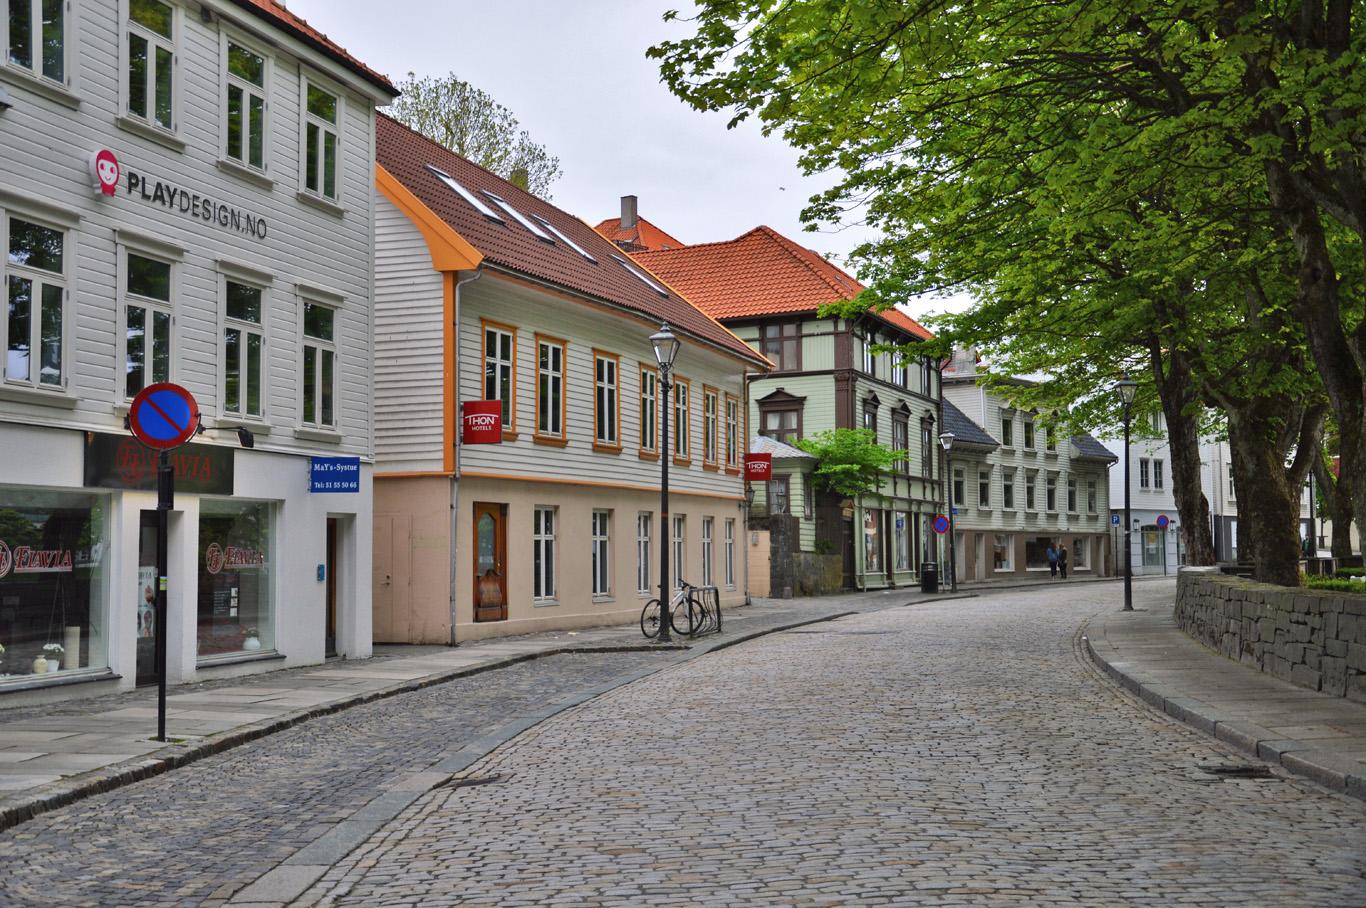 Typical street in Stavanger